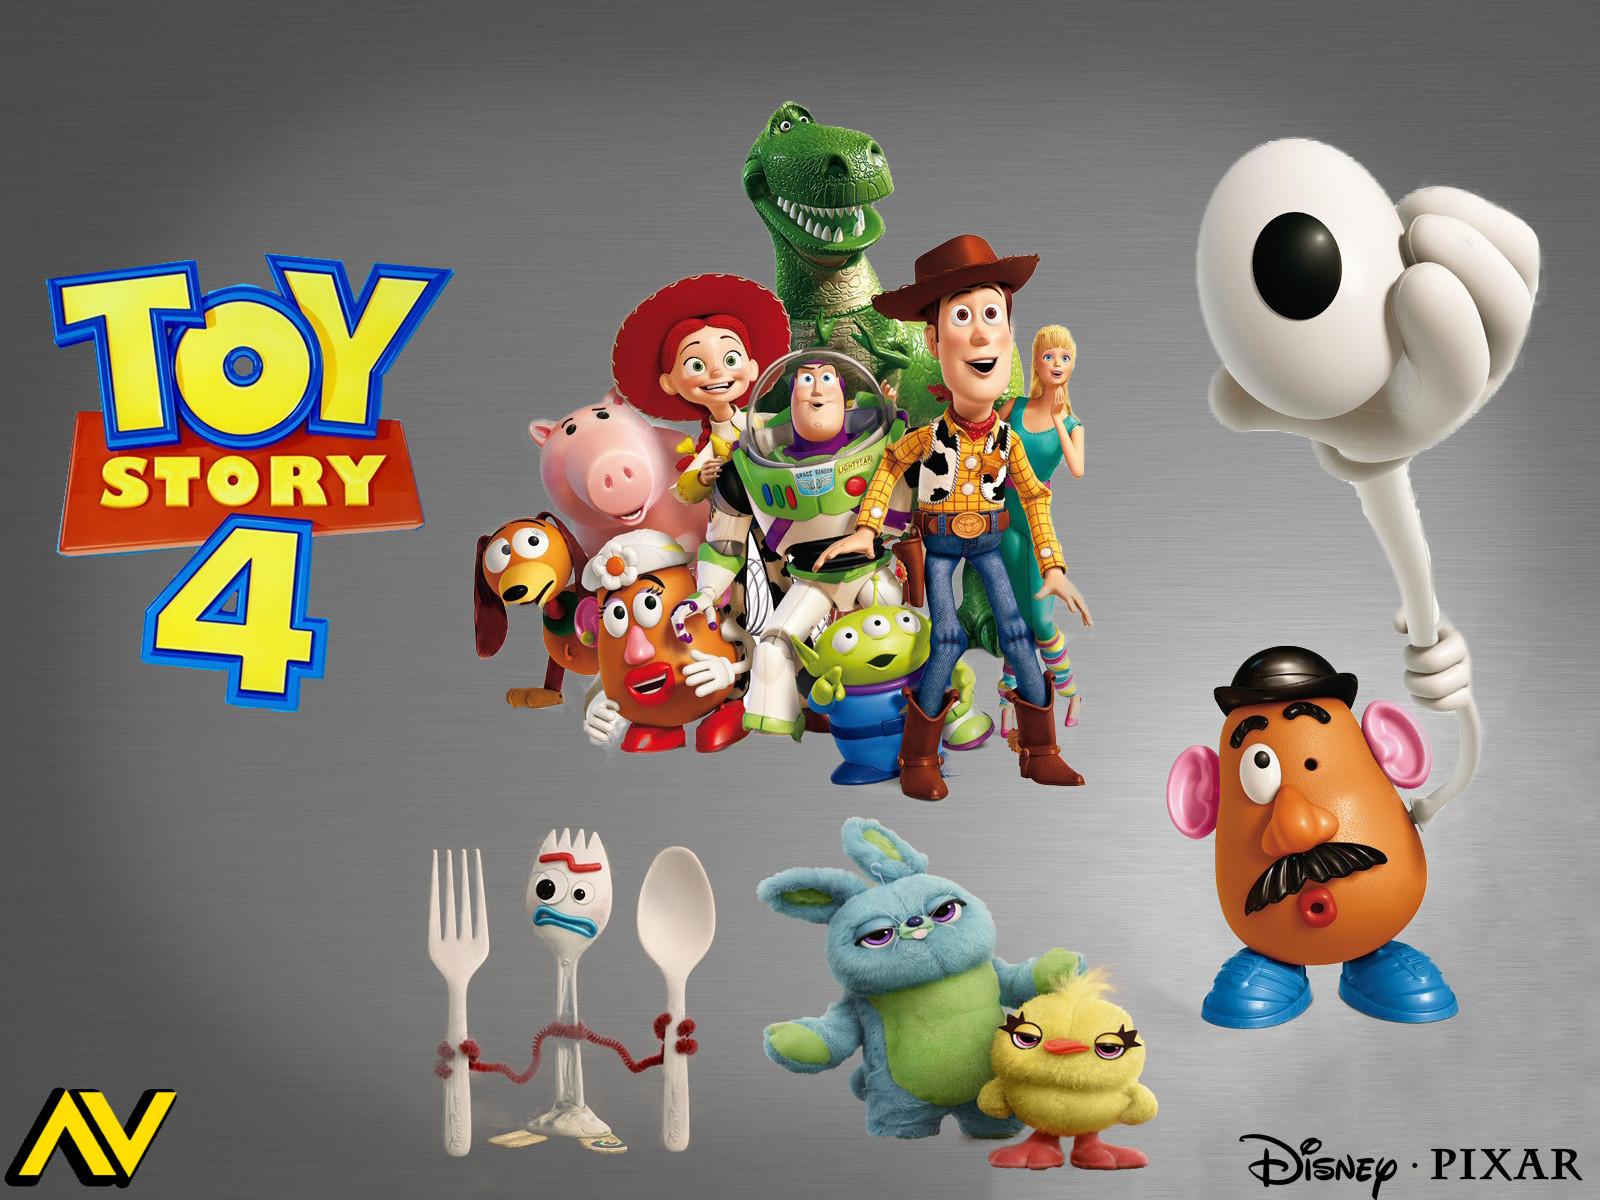 Artstation Toy Story 4 Poster Design Vindz Henchman